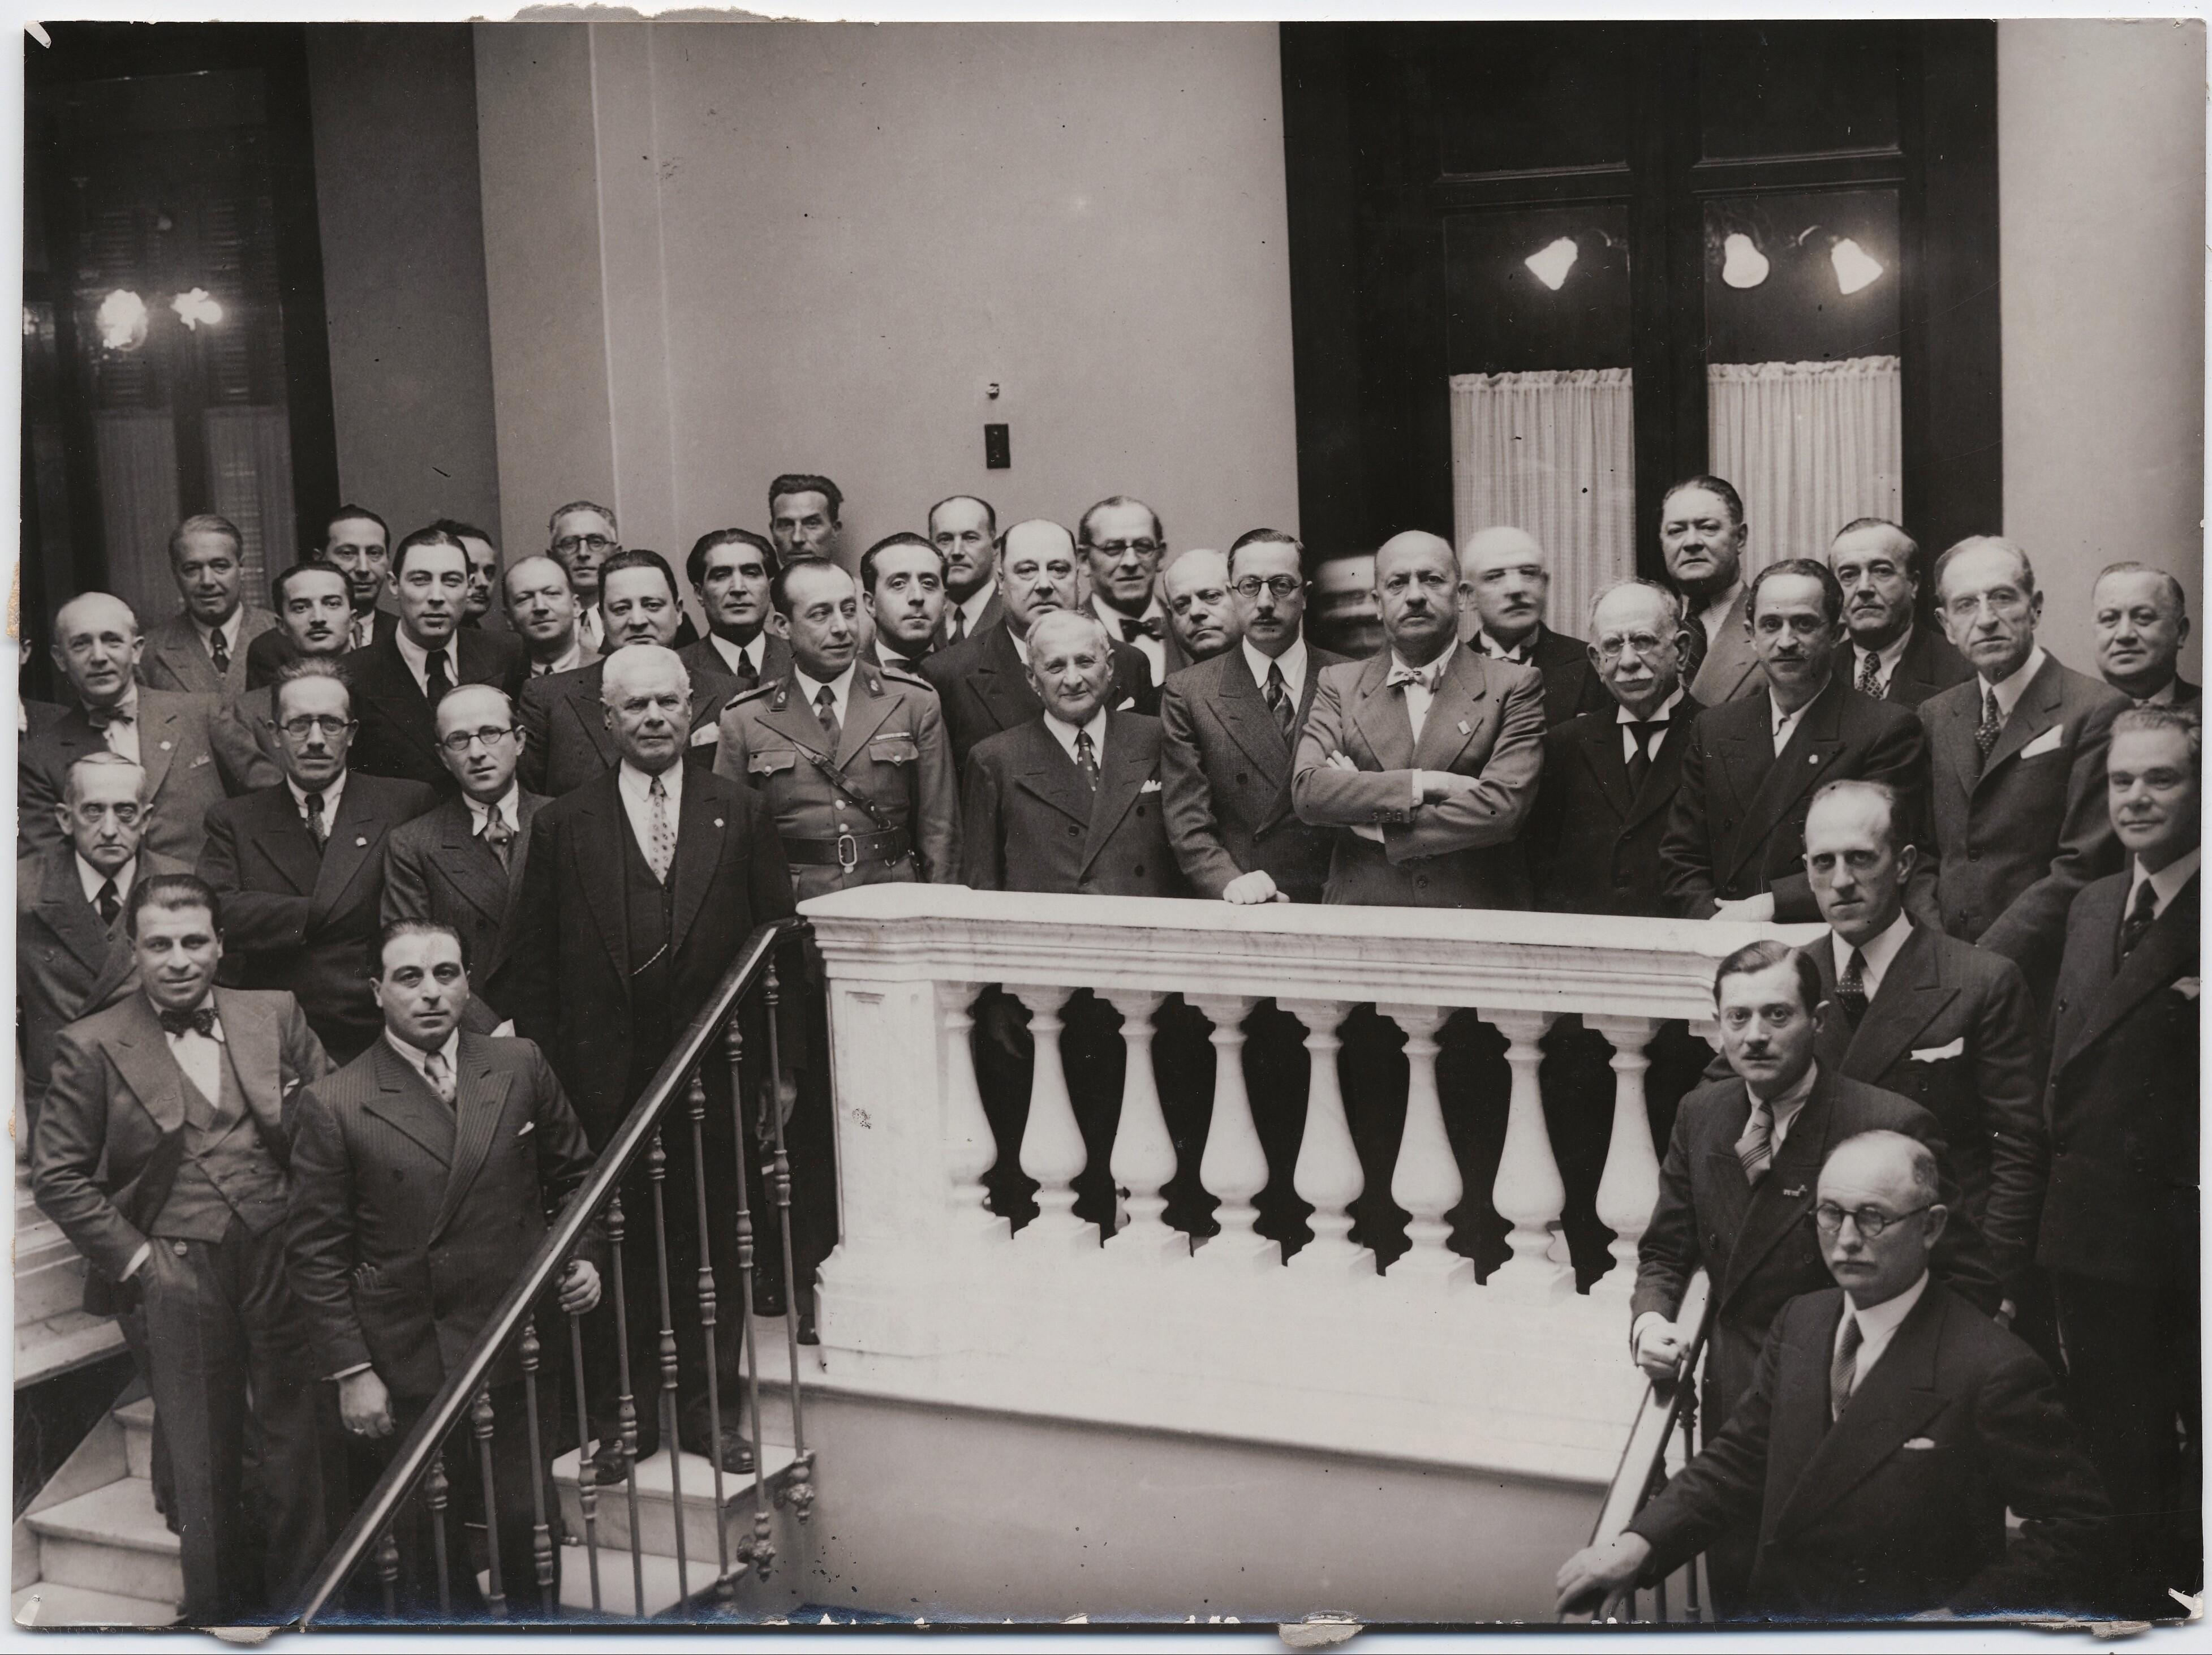 1926. Монтевидео, Уругвай. Маринетти с поклонниками